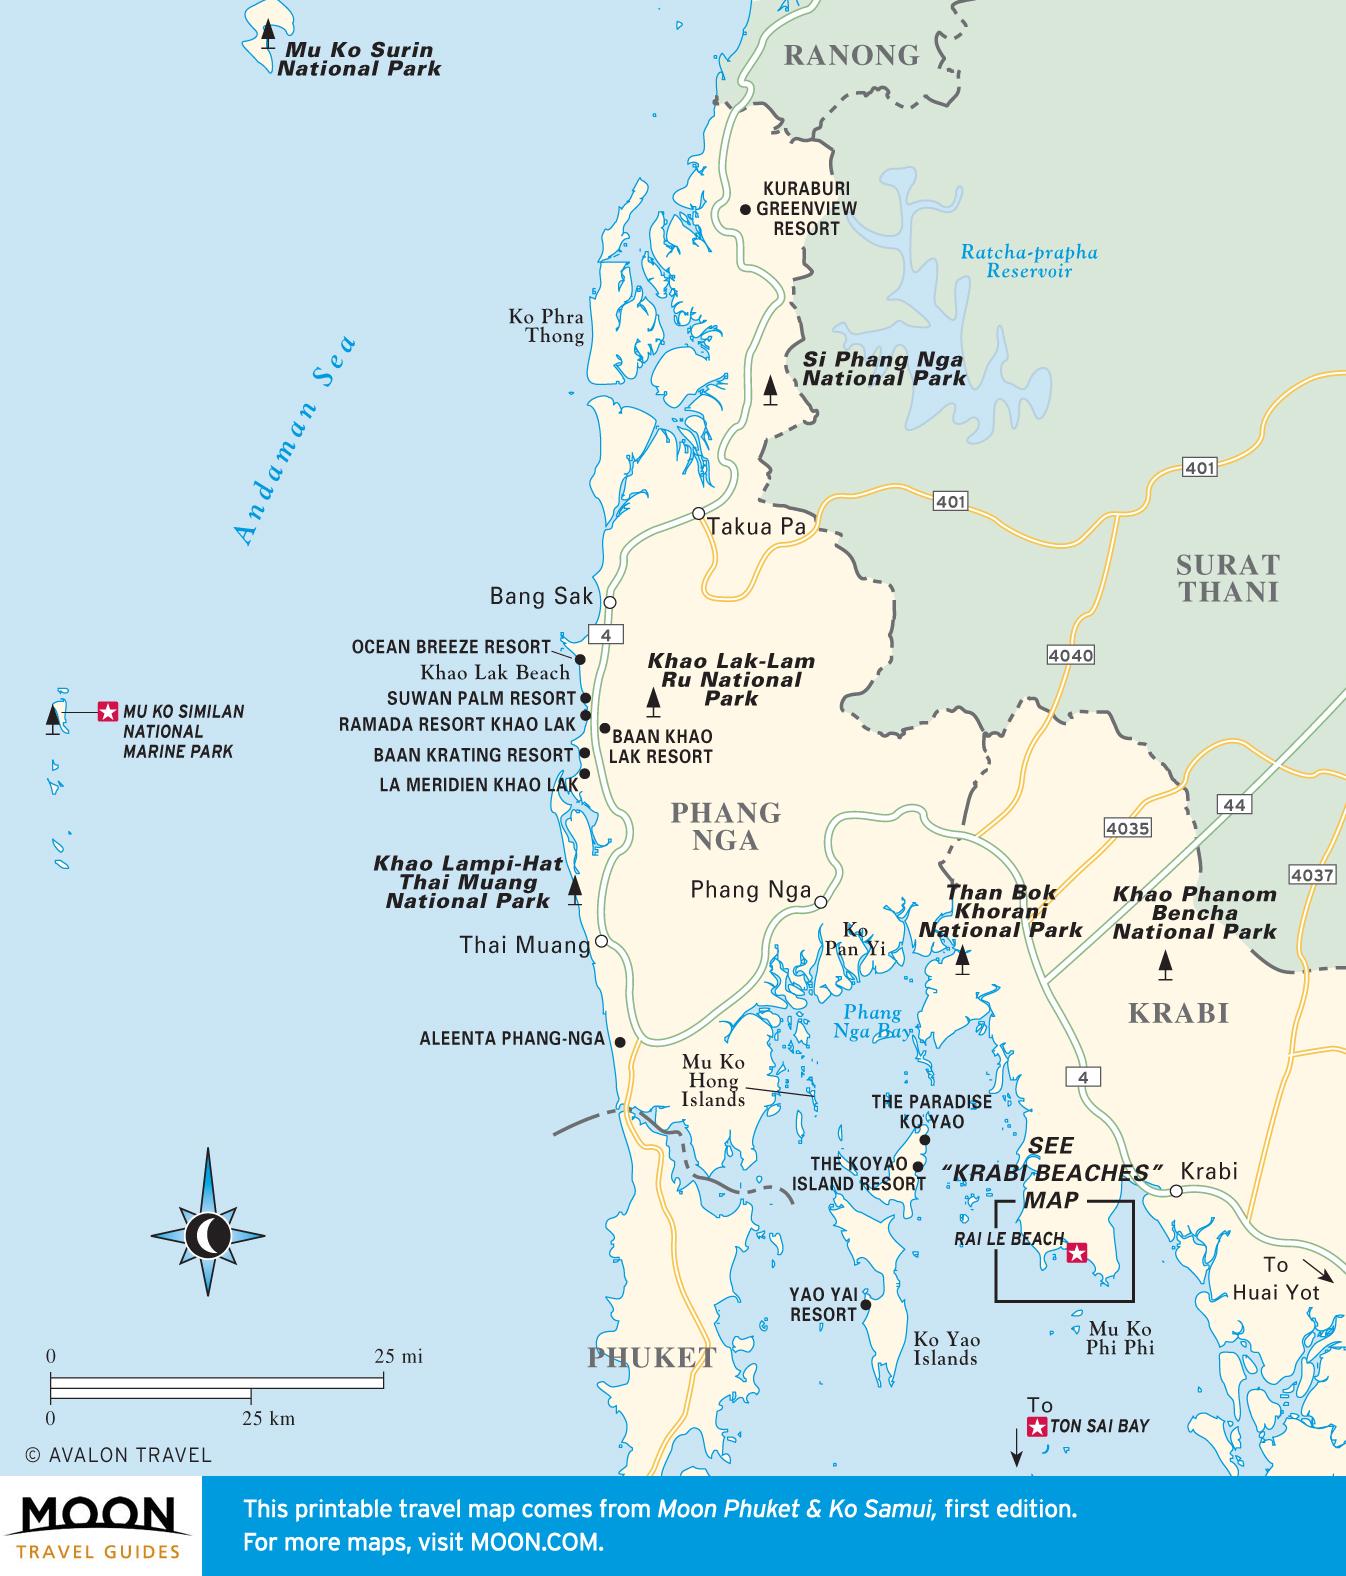 Krabi Island Map on batam island map, cebu island map, hong kong island map, vancouver island map, amsterdam island map, bintan island map, koh mook island map, phu quoc island map, racha island map, samui island map, redang island map, thailand island map, surin island map, lombok island map, bali island map, koh phangan map, tioman island map, taipei island map, phuket map, paris island map,